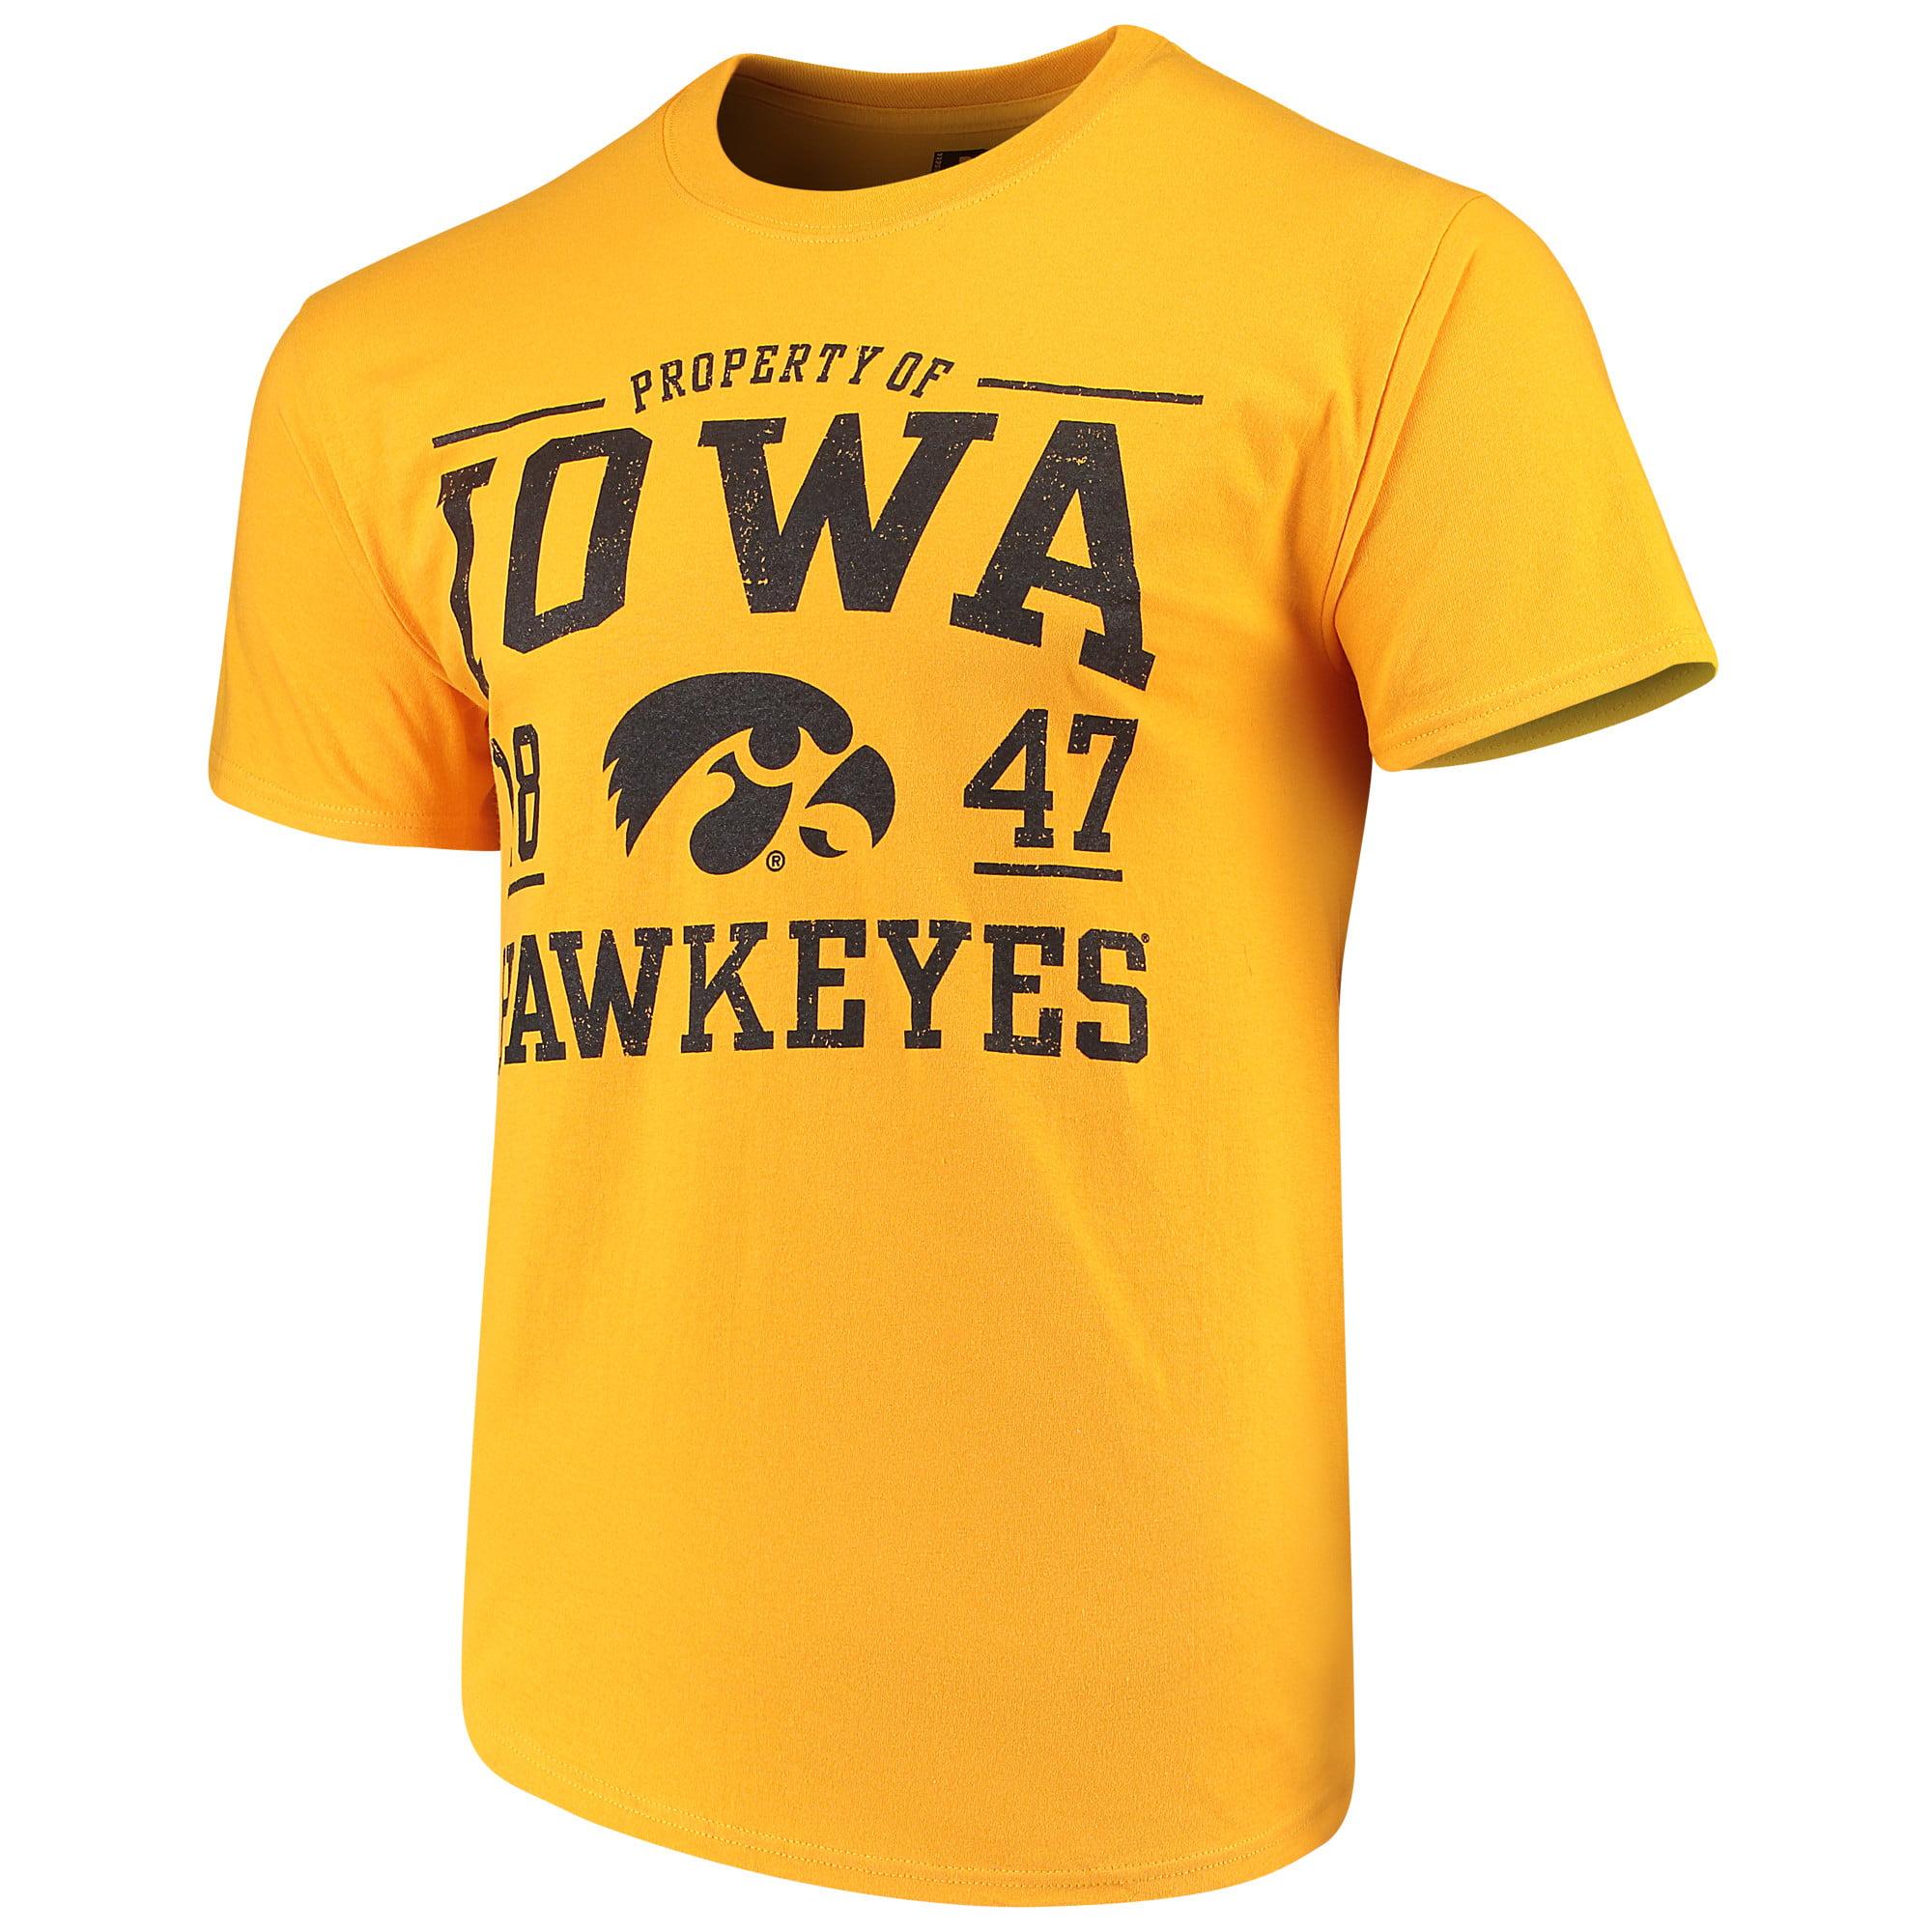 Men's Russell Gold Iowa Hawkeyes Crew Distressed Print T-Shirt